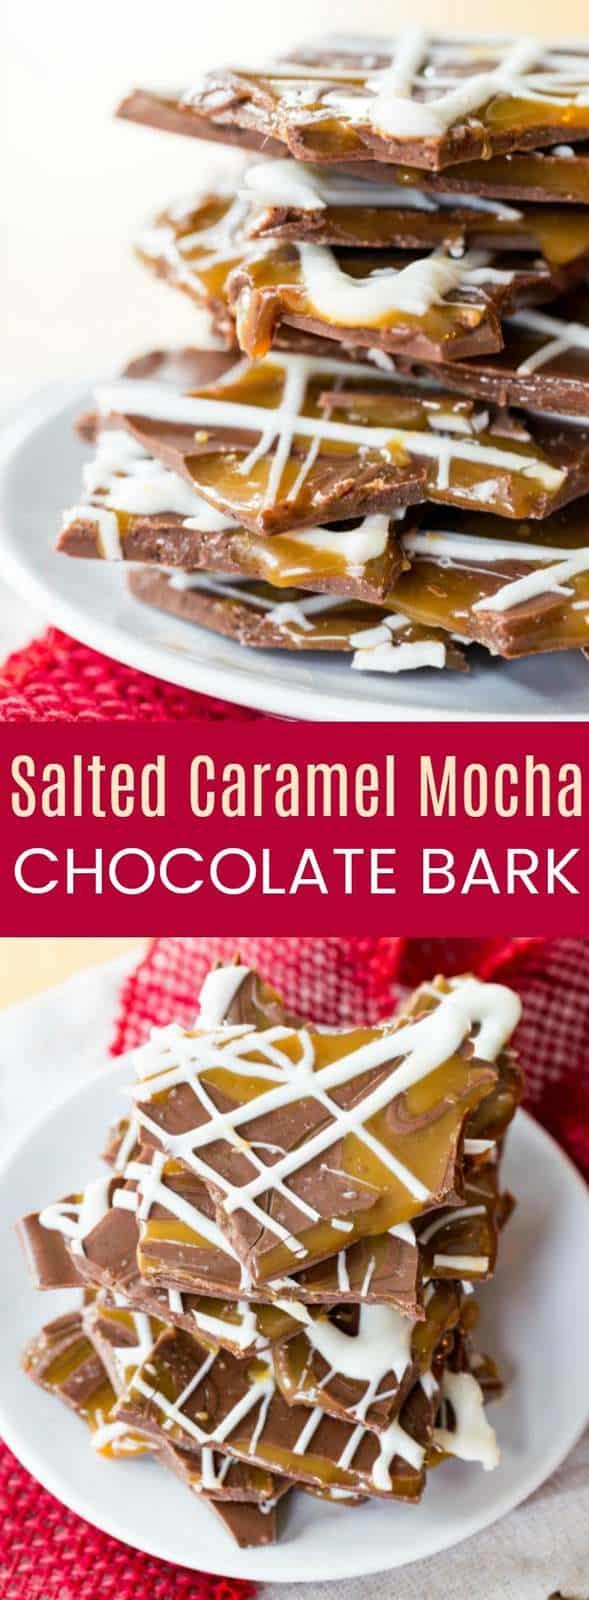 Salted Caramel Mocha Chocolate Bark from cupcakesandkalechips